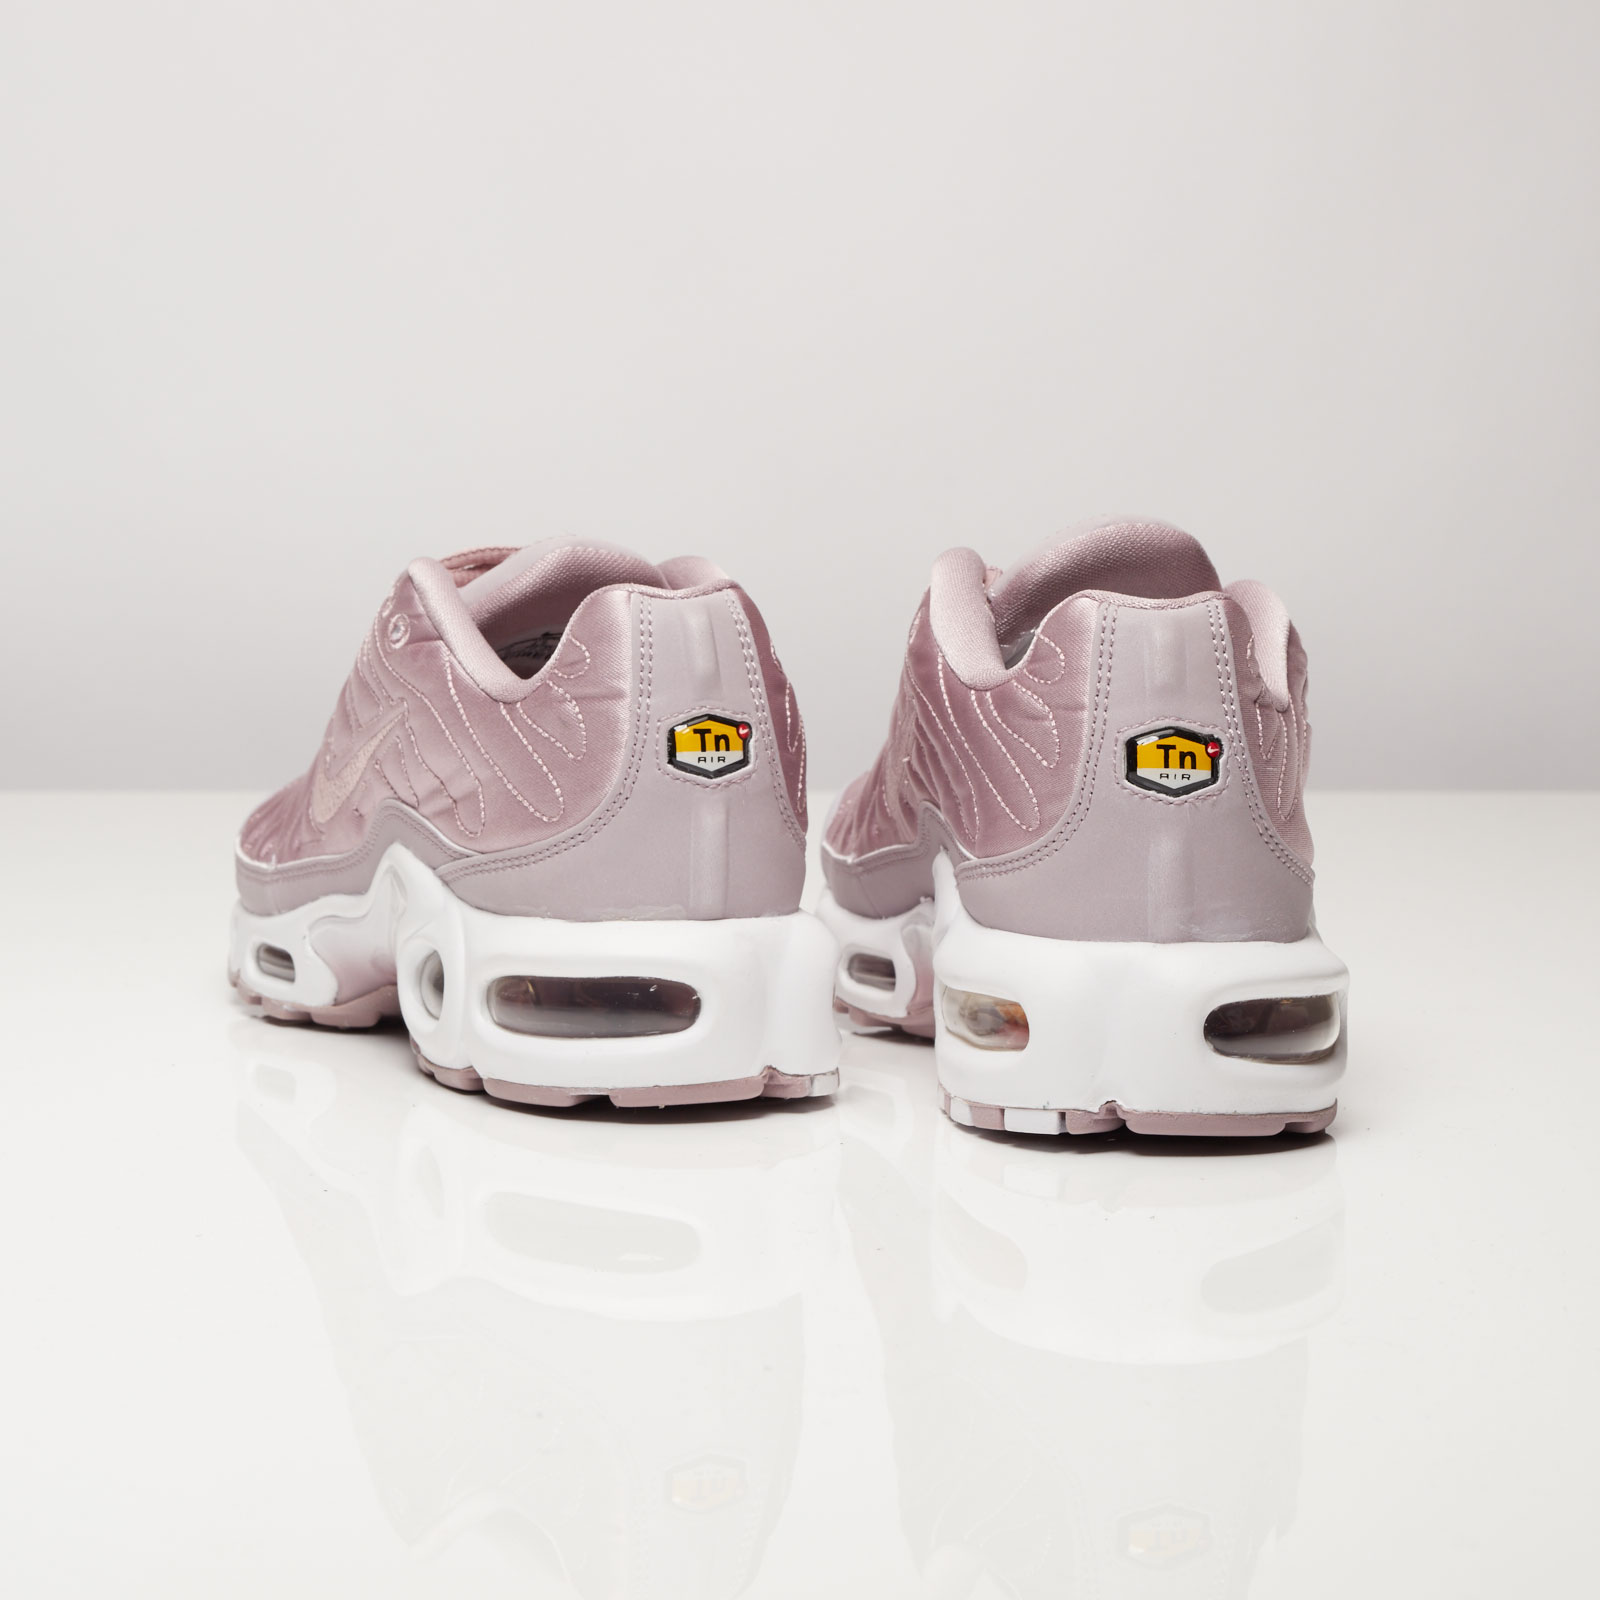 2332773c90 Nike Wmns Air Max Plus SE - 830768-551 - Sneakersnstuff | sneakers &  streetwear online since 1999